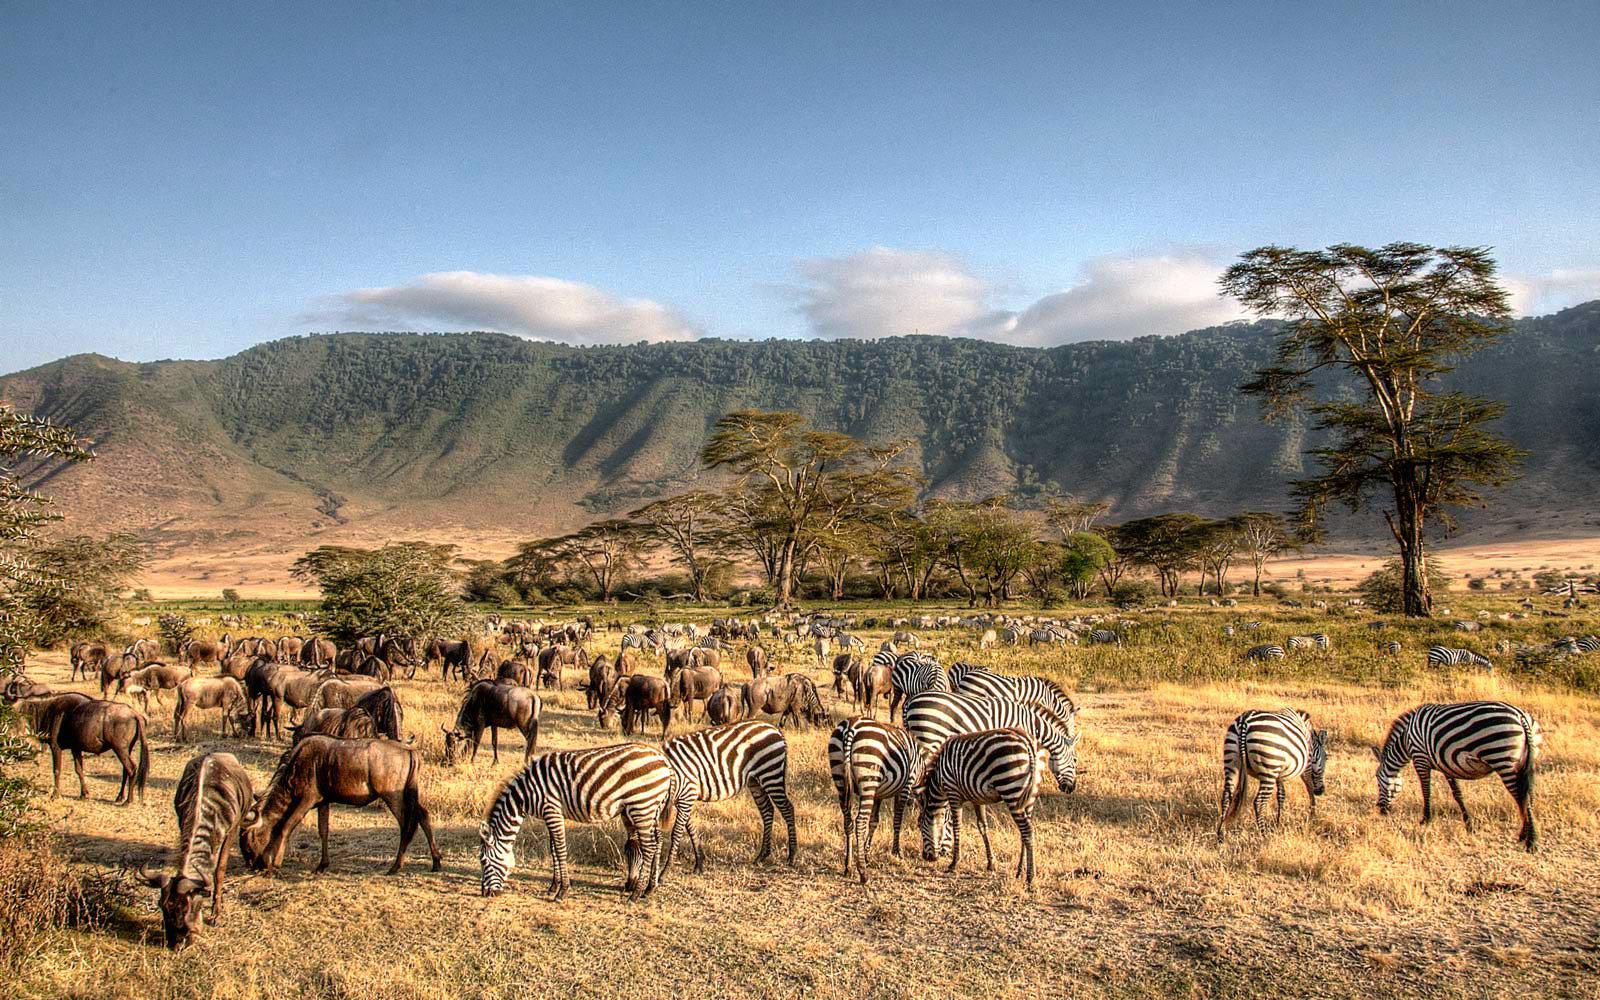 Win an All-Inclusive 5-Day Trip to Tanzania